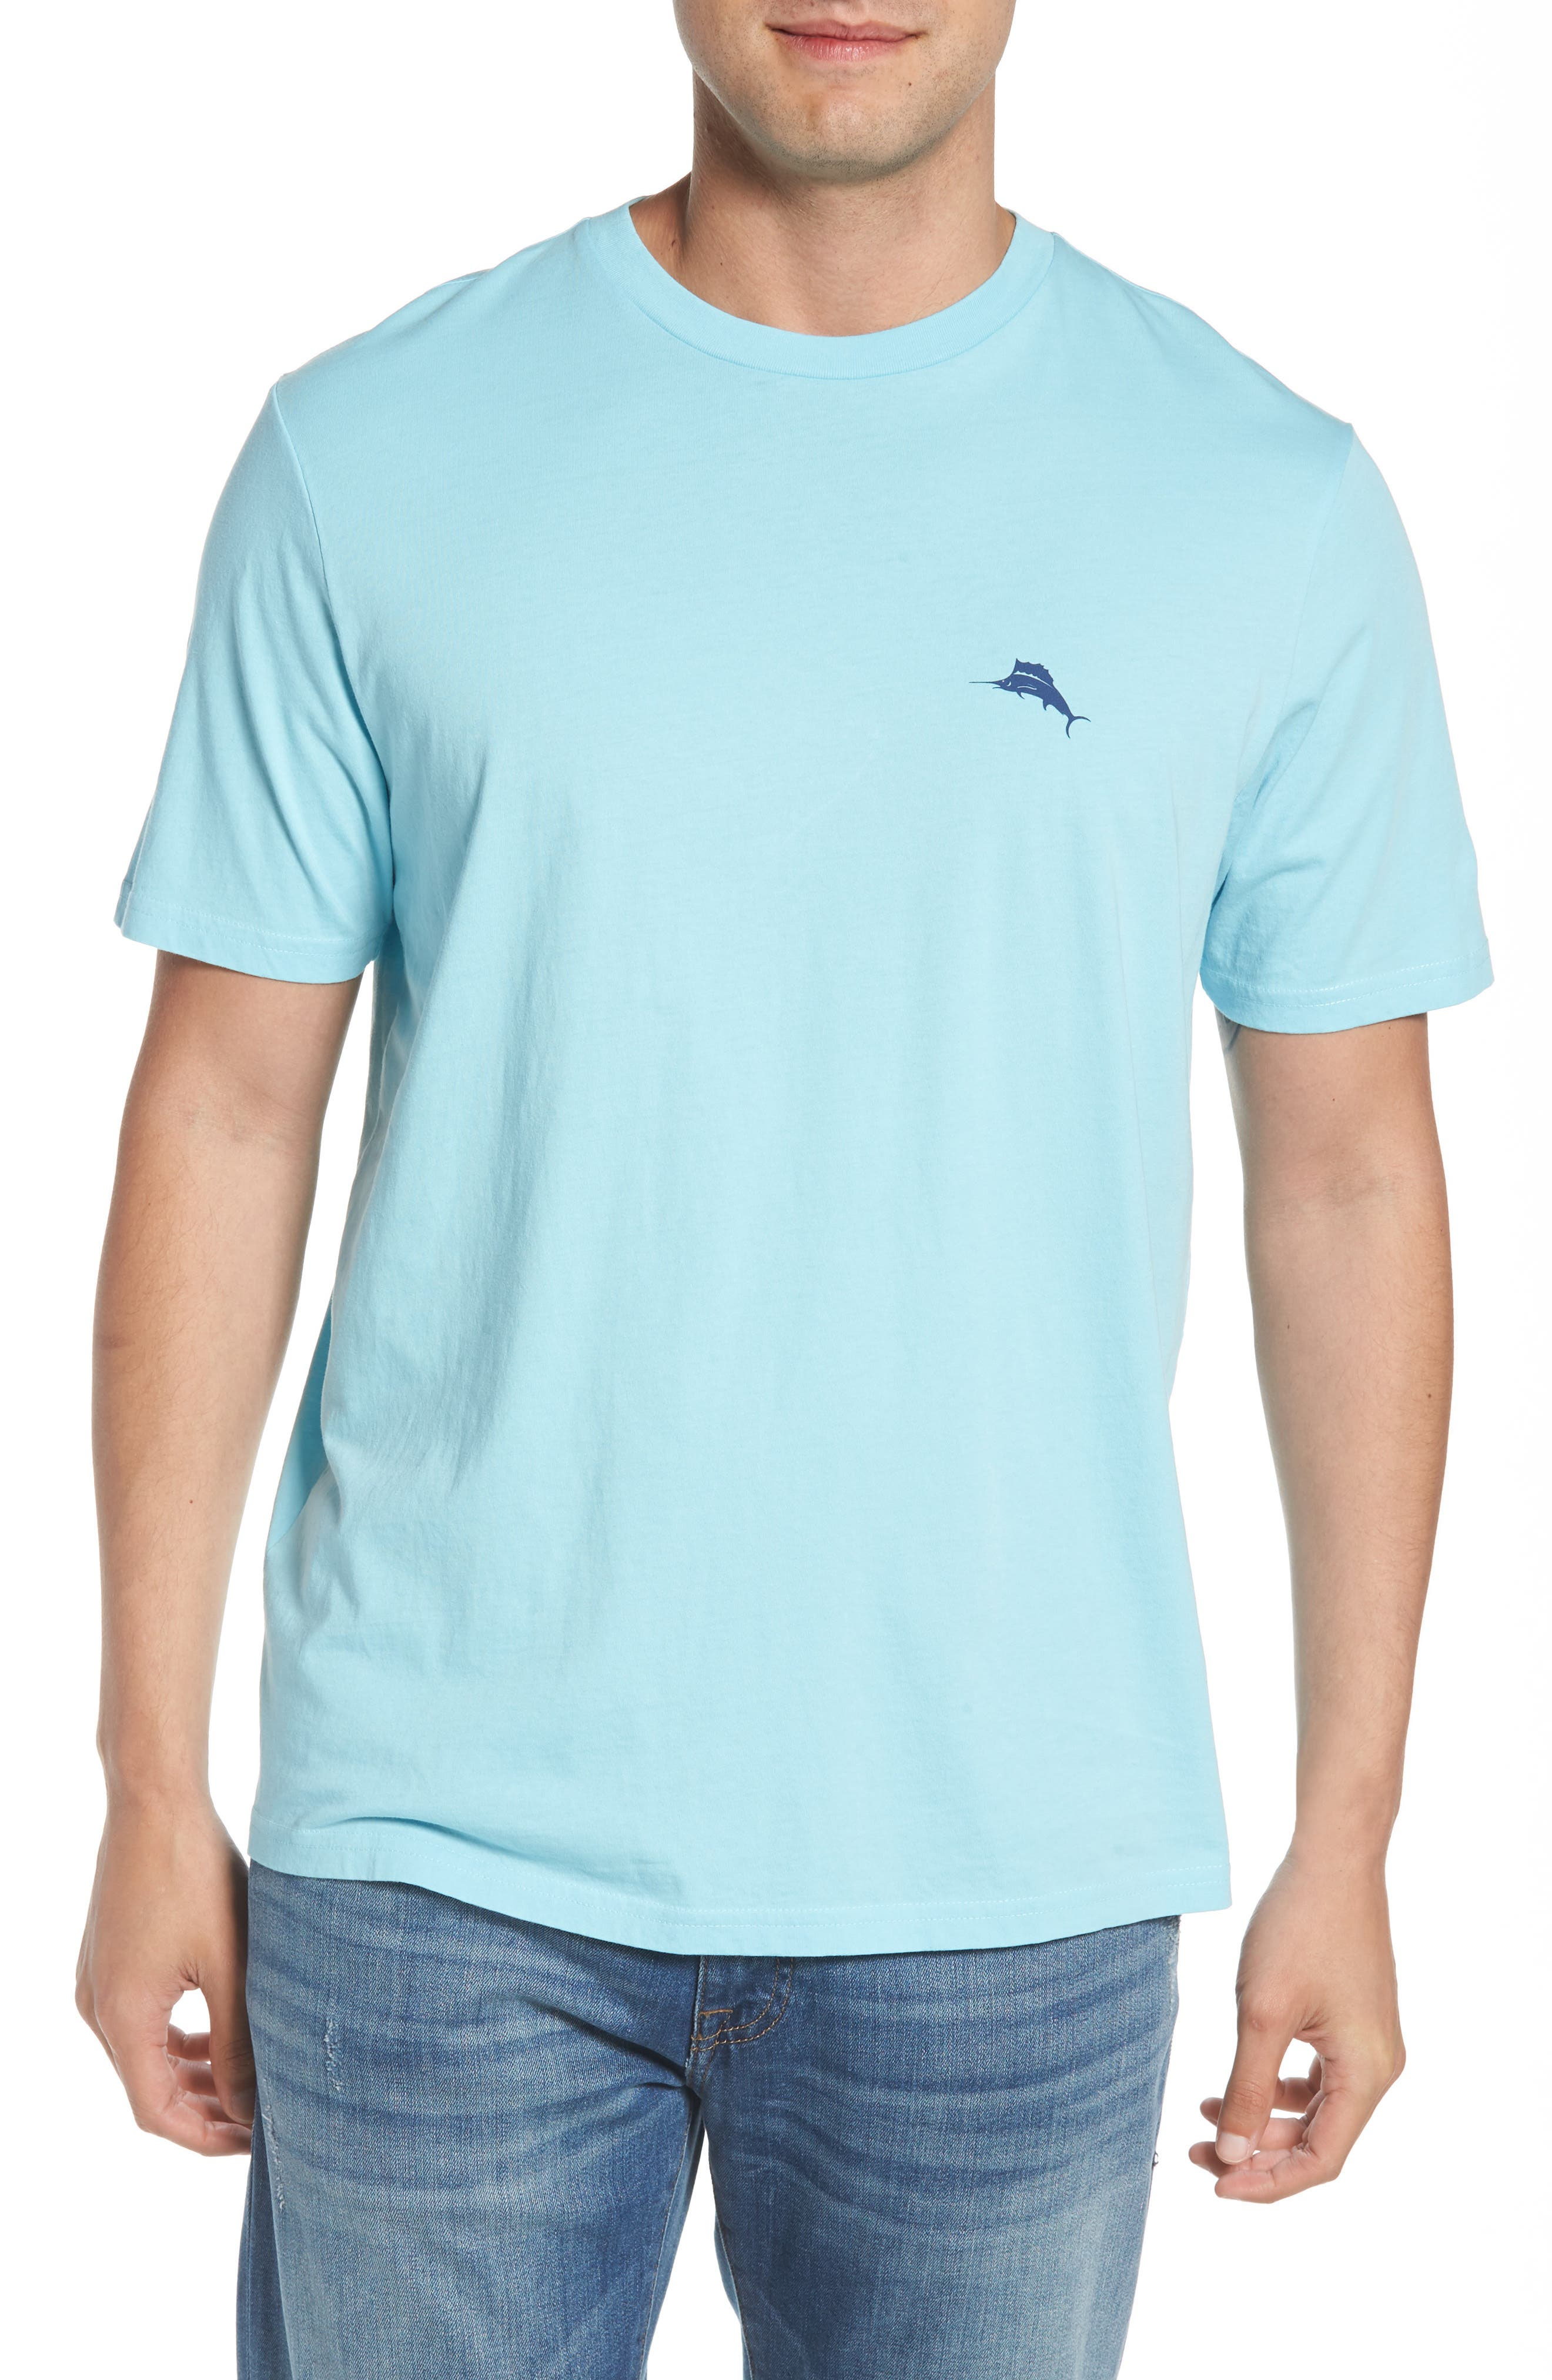 Tommy Bahama Followers on Line T-Shirt